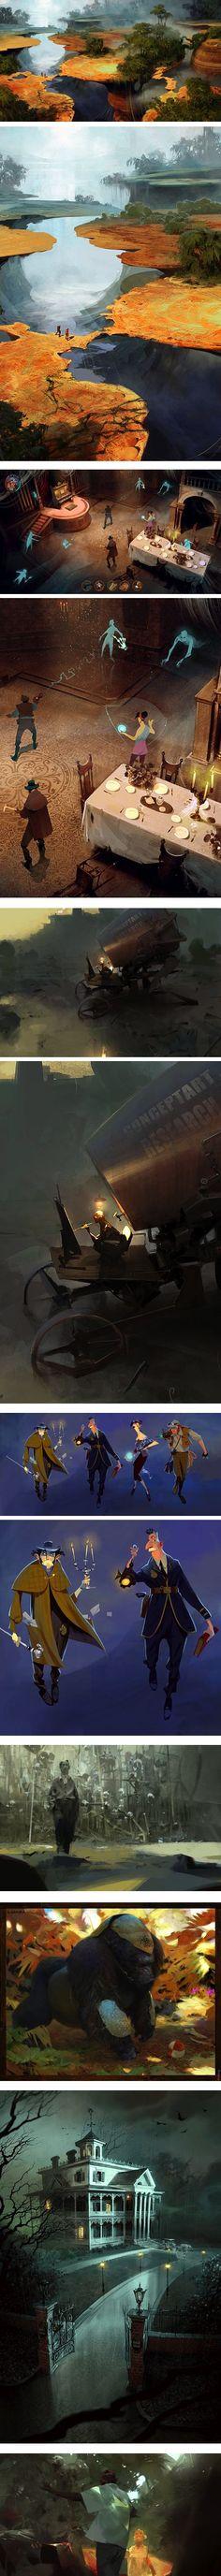 Sergey Kolesov, concept artist ★ Find more at http://www.pinterest.com/competing/